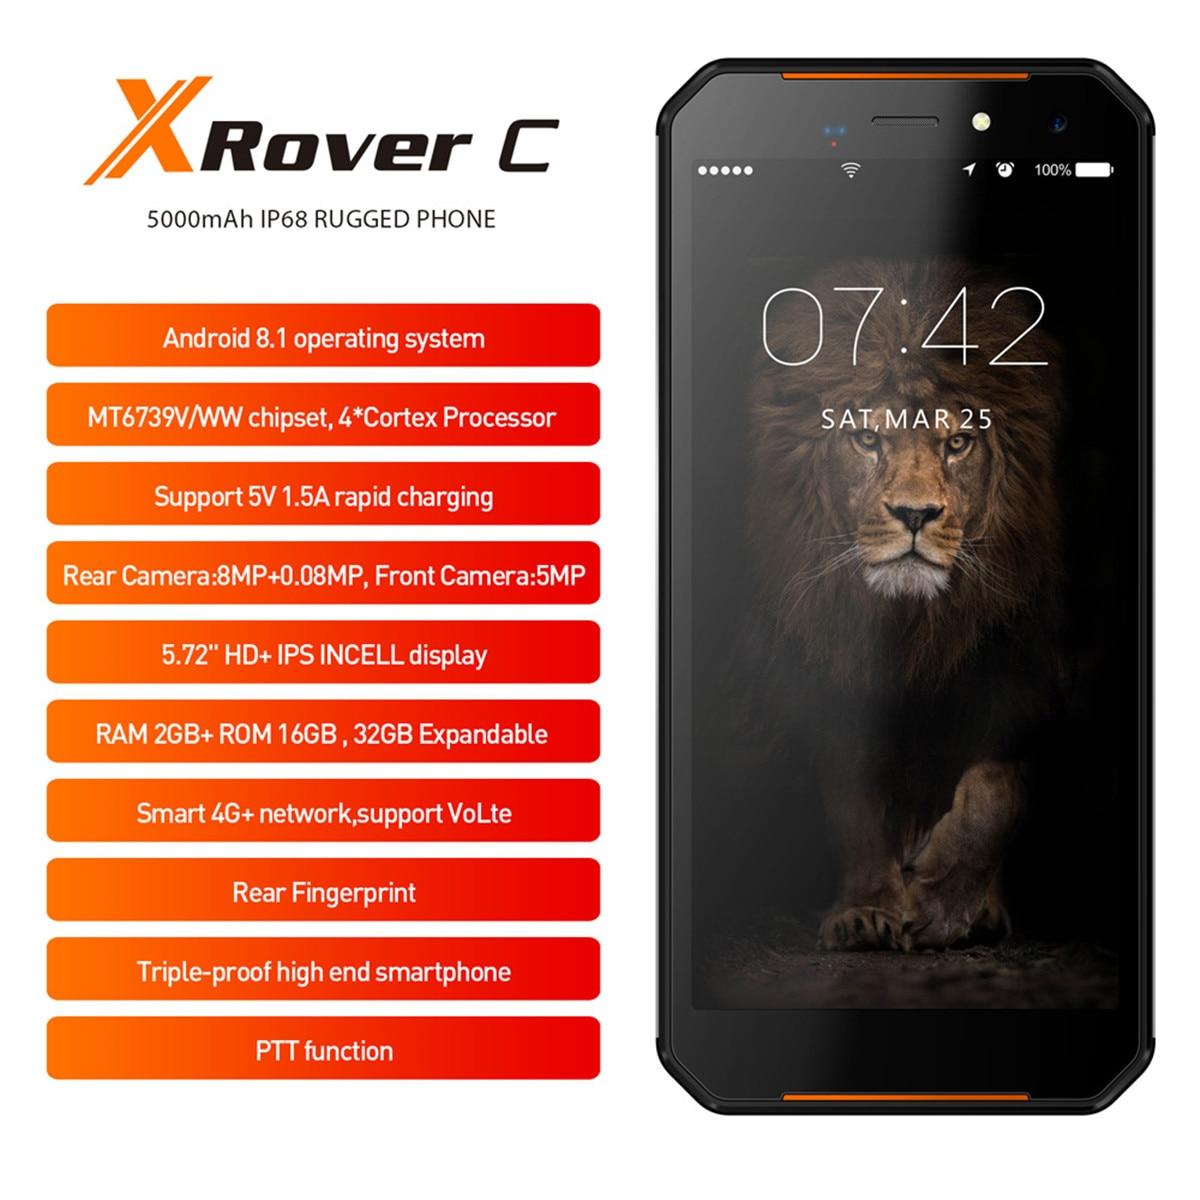 "LEAGOO XRover C IP68 4G Smartphone 16GB ROM 2GB Waterproof Fingerprint Face 5.72"" IPS 5000mAh 13MP Dual Rear Cams Mobile Phone"